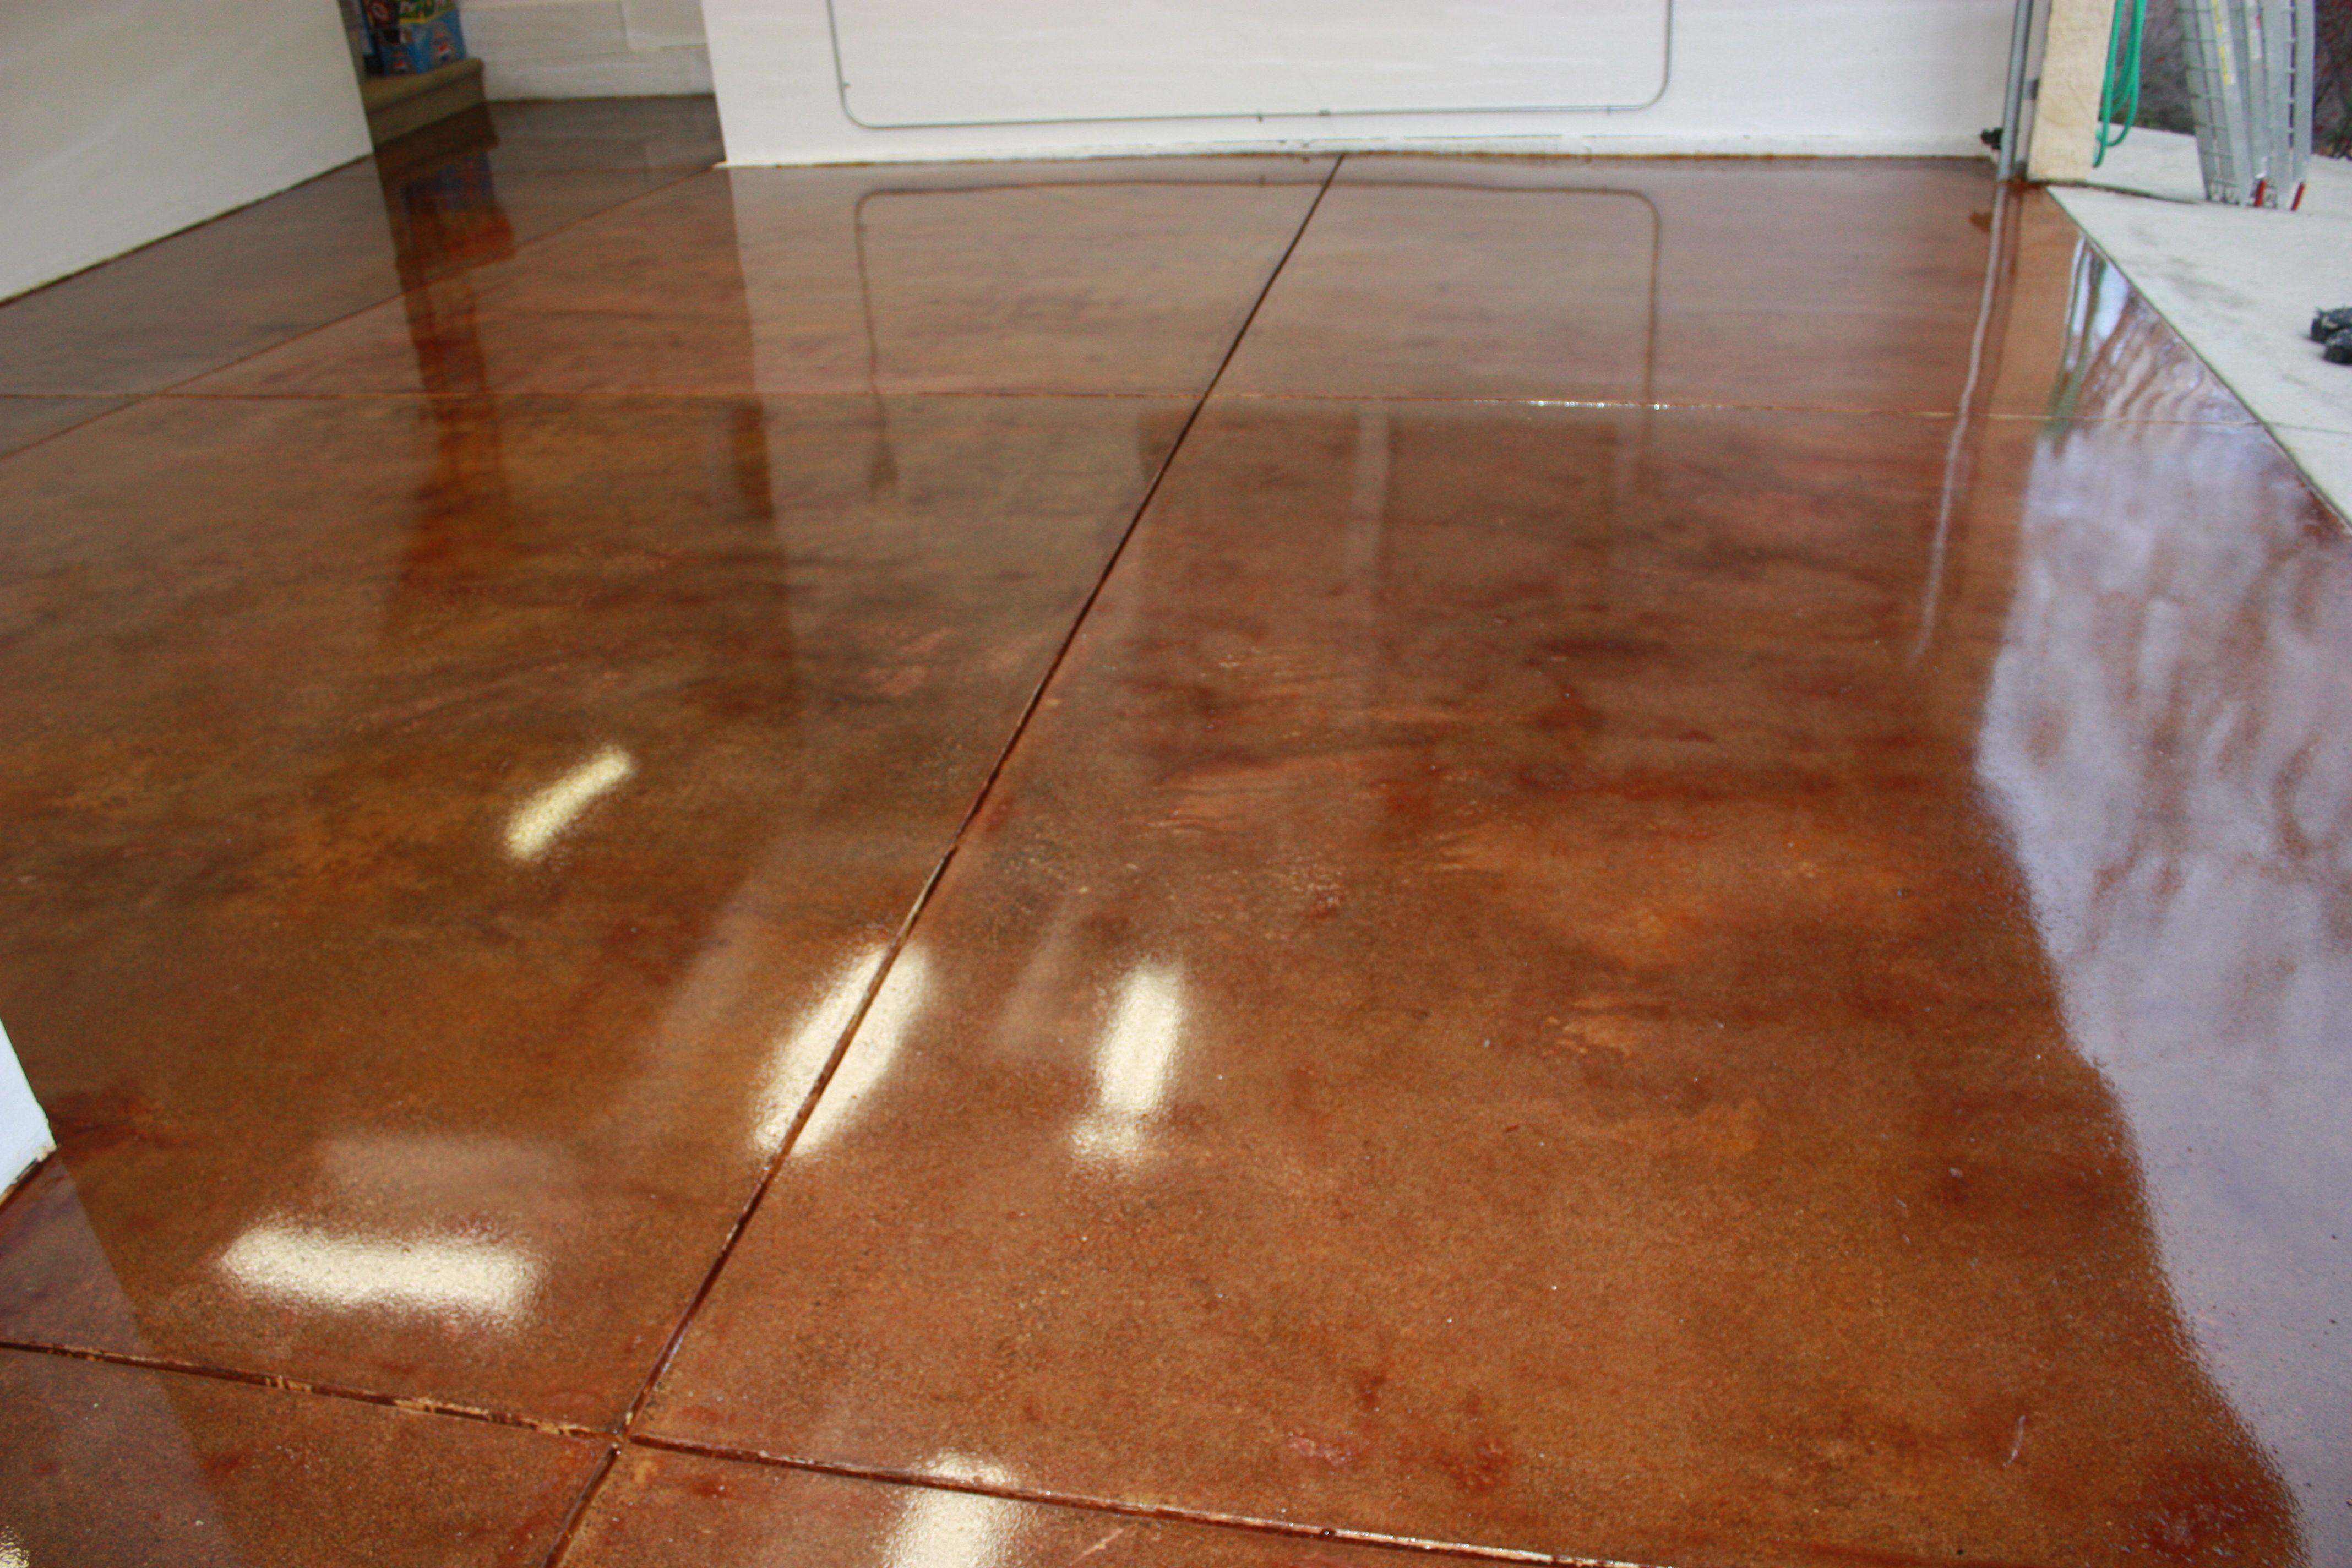 Colored Concrete Floor So Warm Looking Concrete Floors